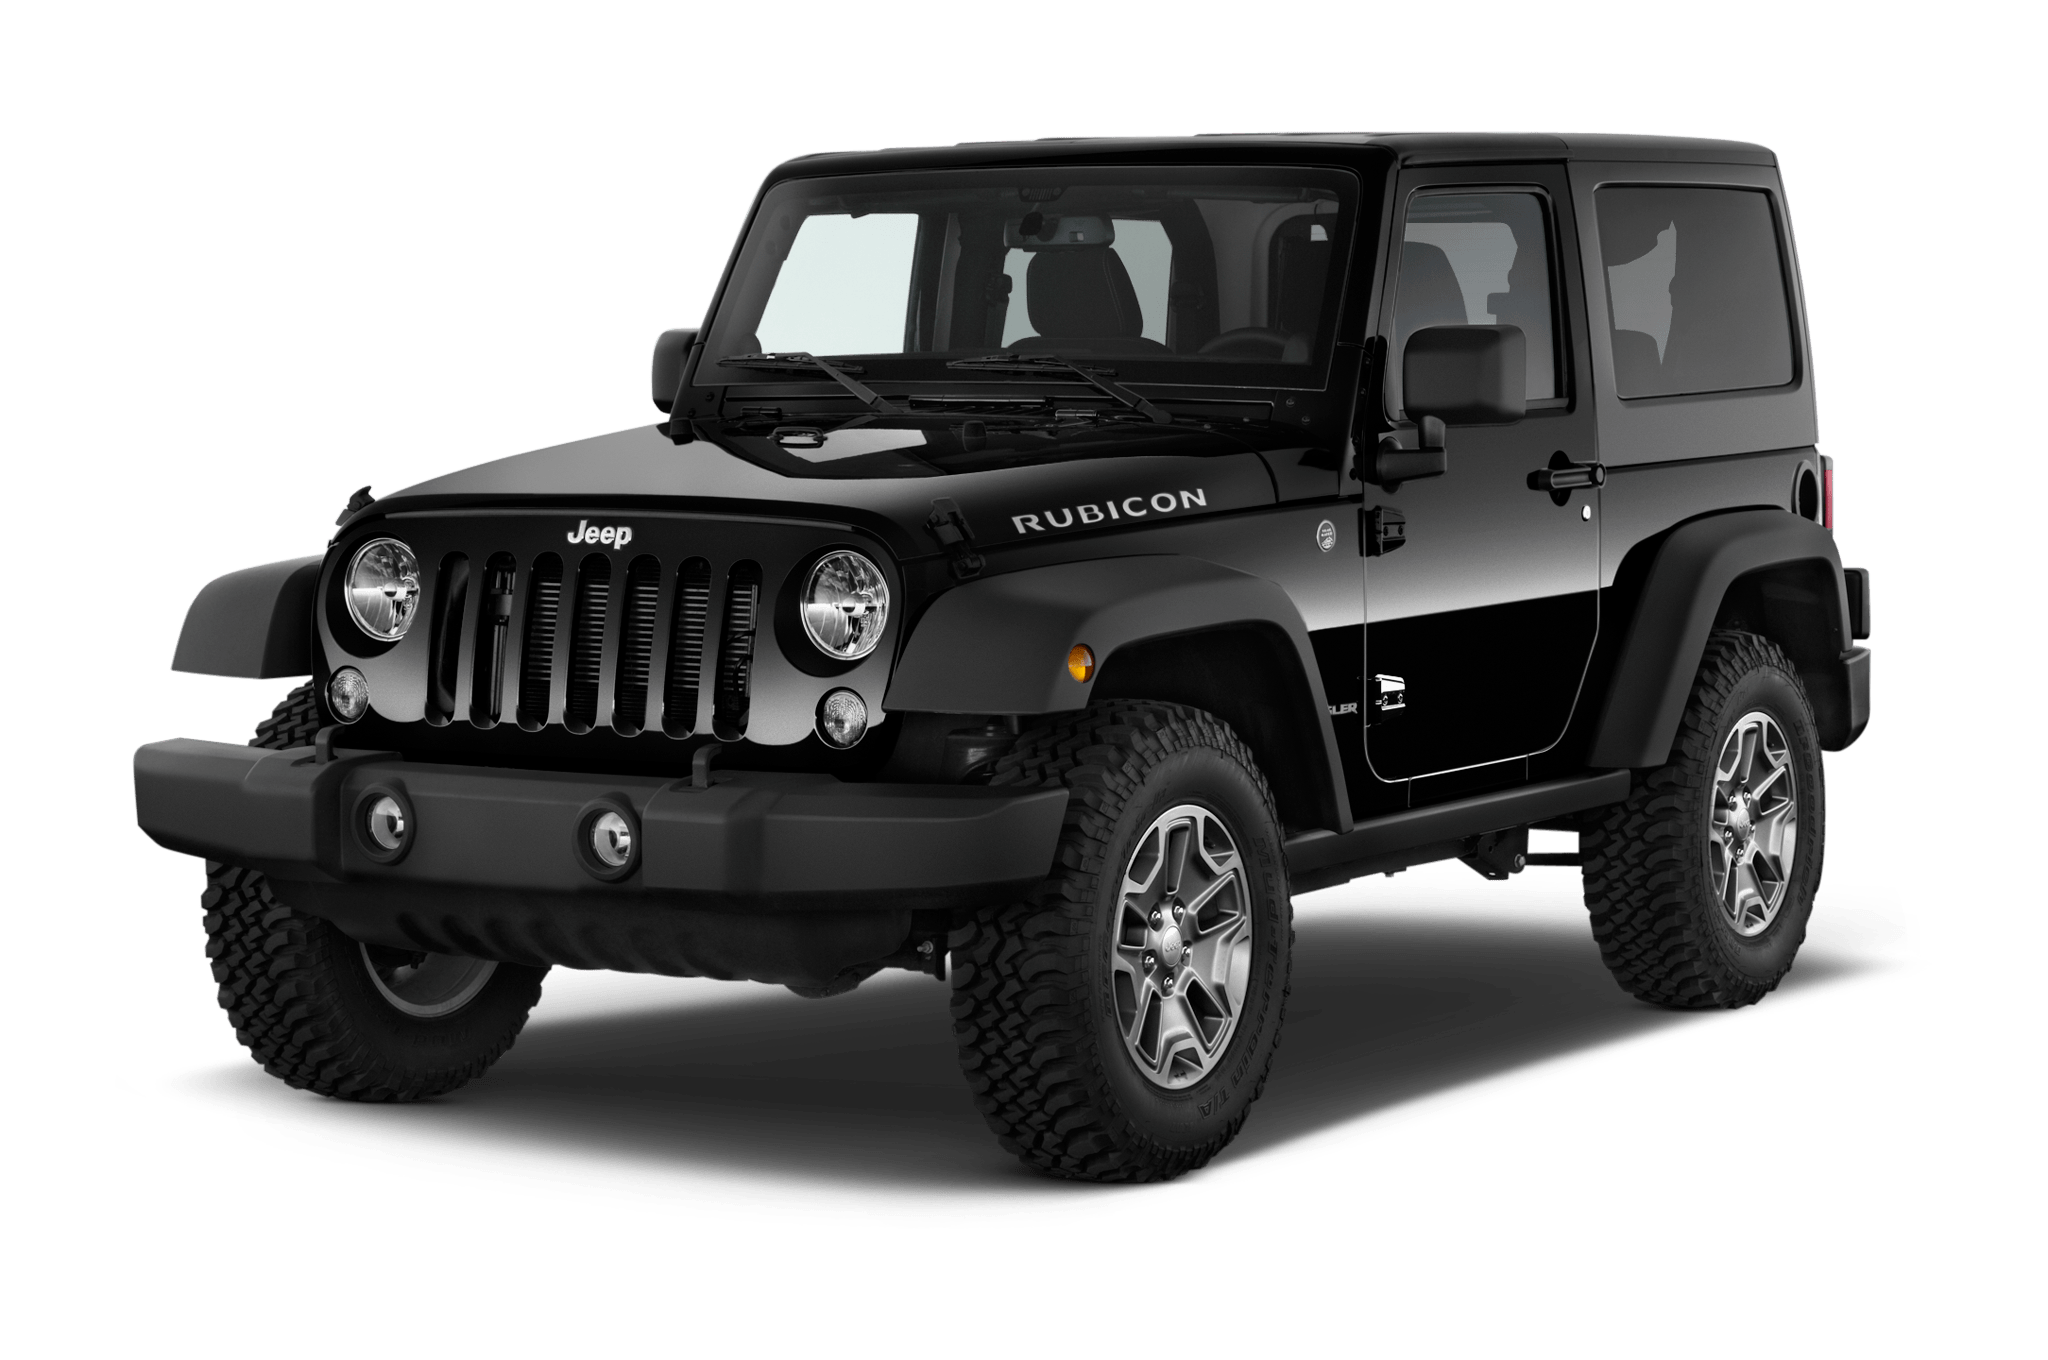 Awesome Used Black Jeep Jeep Wrangler Unlimited 2009 Jeep Wrangler Unlimited 2014 Jeep Wrangler